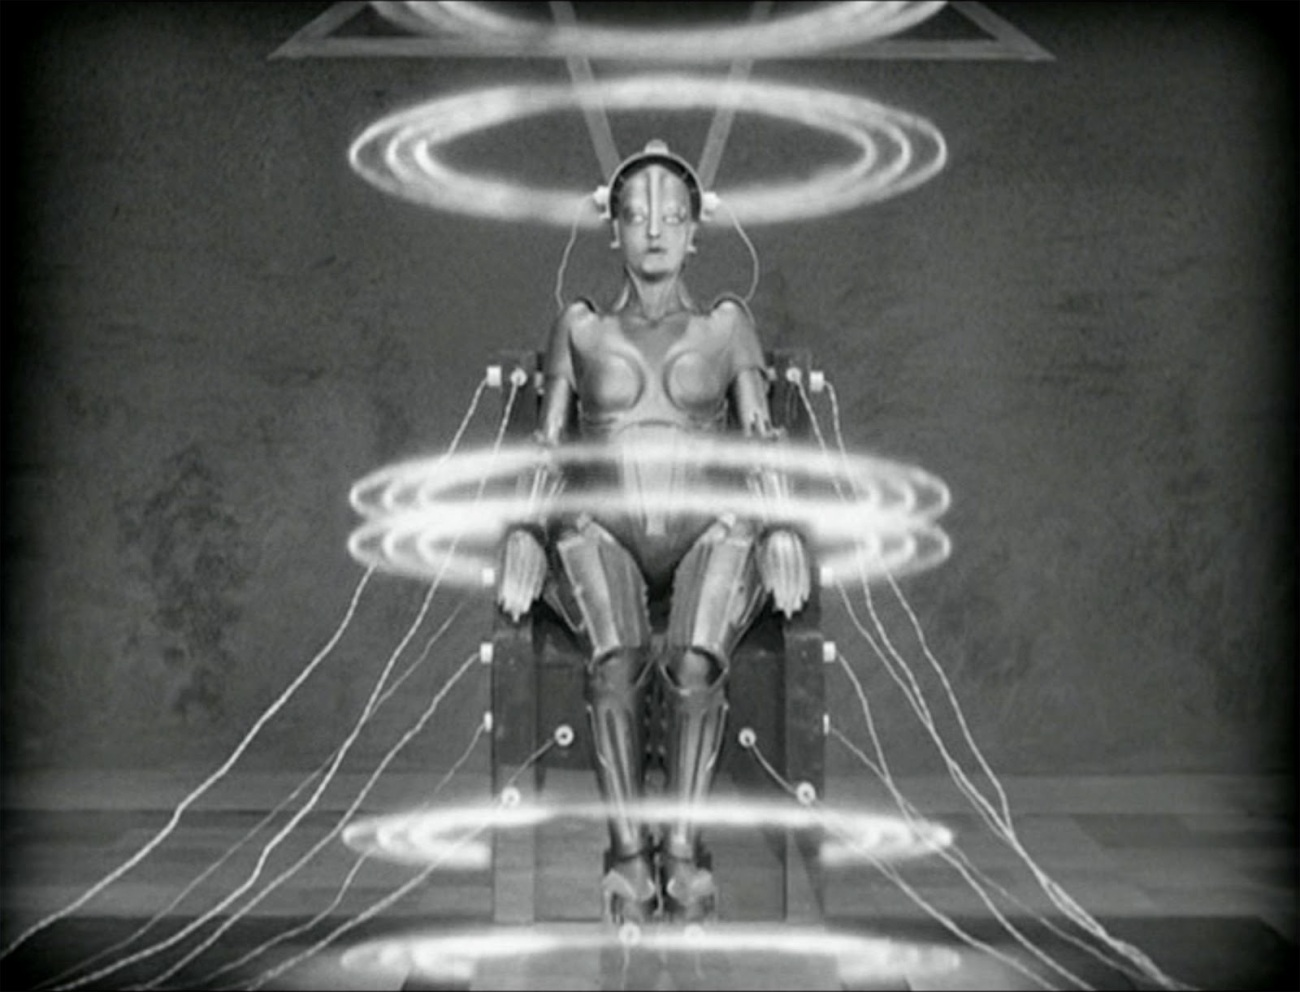 MetropolisRobot